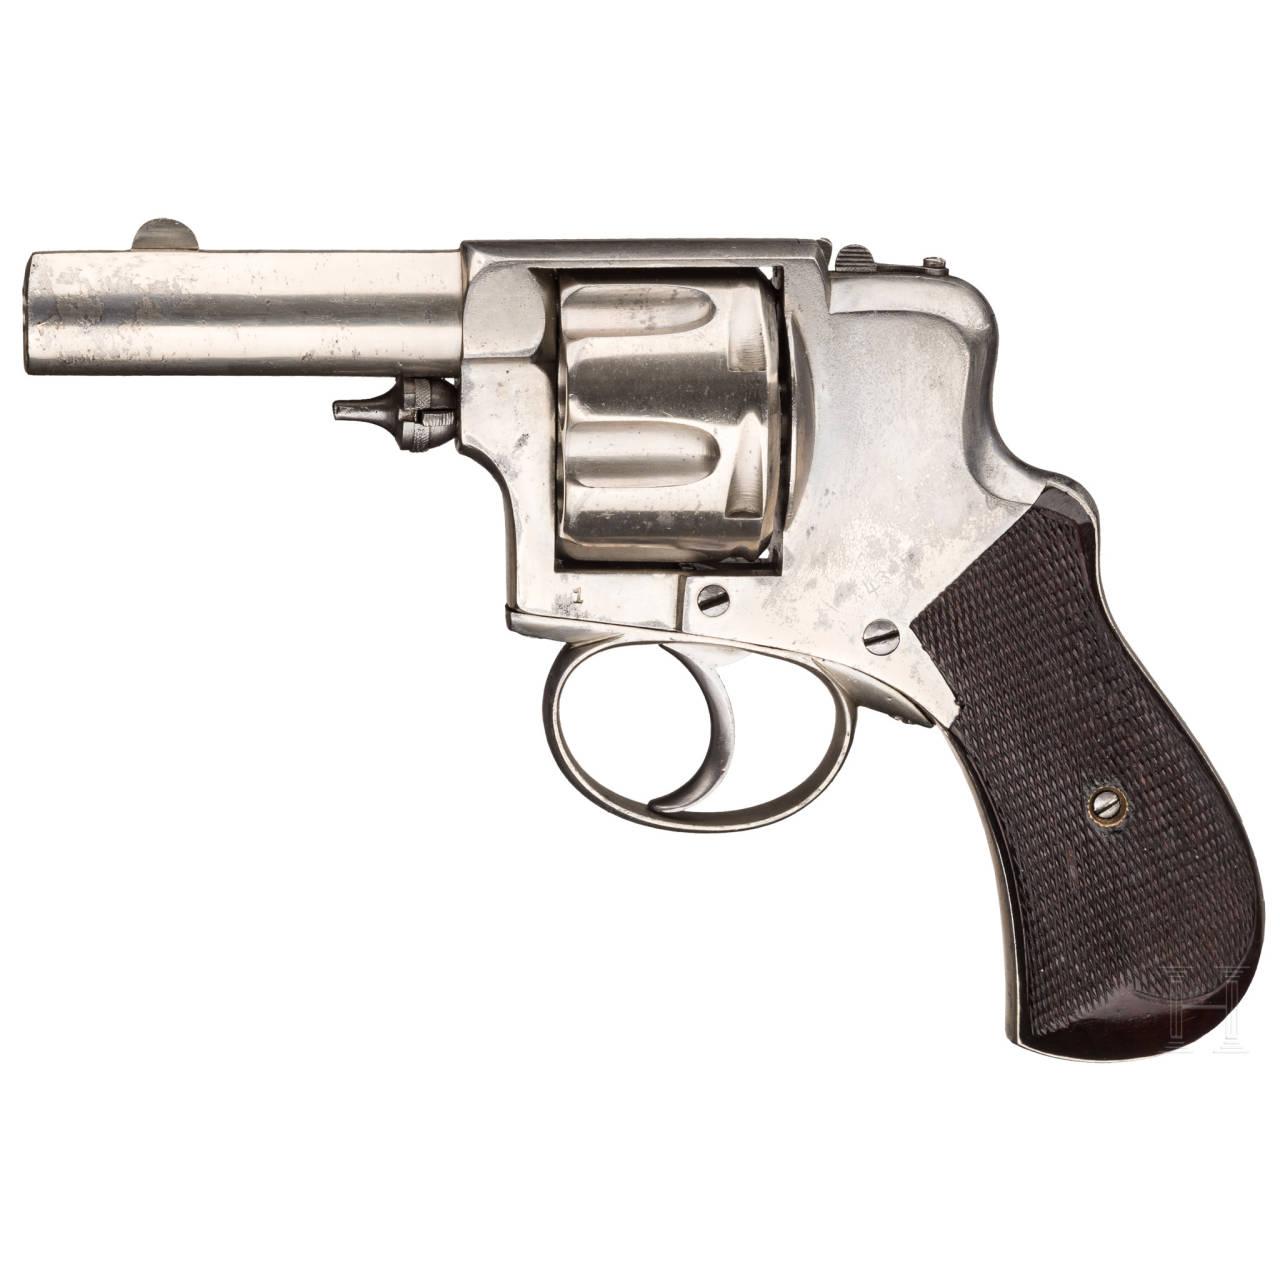 A hammerless Levaux revolver, Liège, prototype, circa 1880